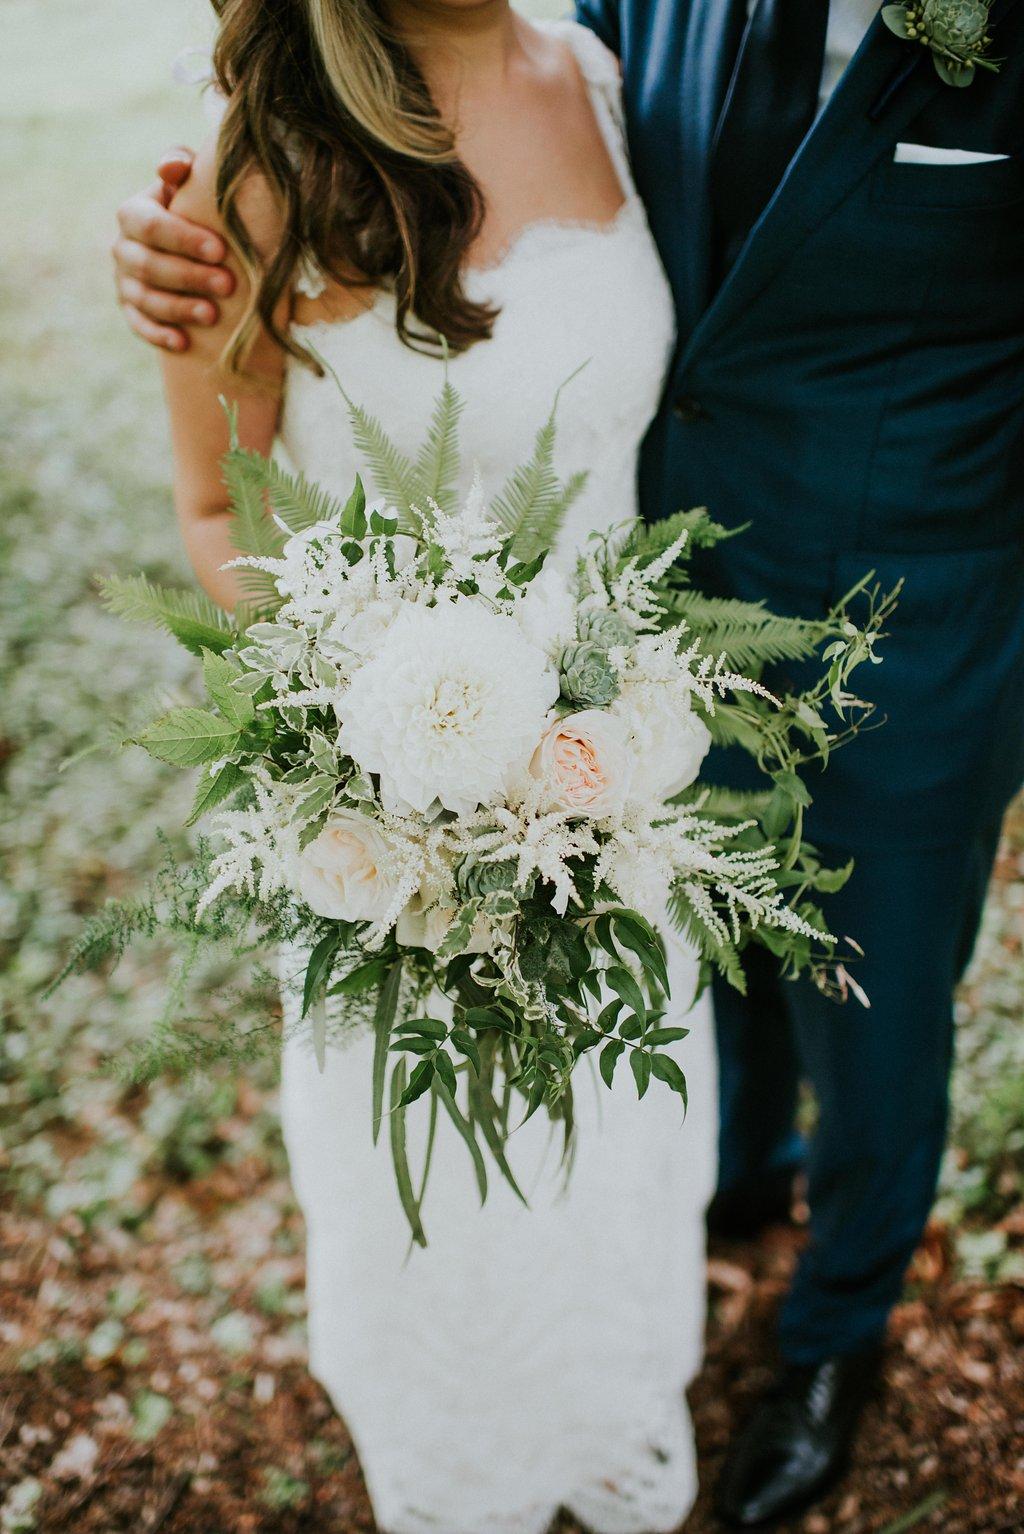 HillbrookClub_Wedding_Cleveland_Jessica+Dani_M+JPhoto-256.JPG